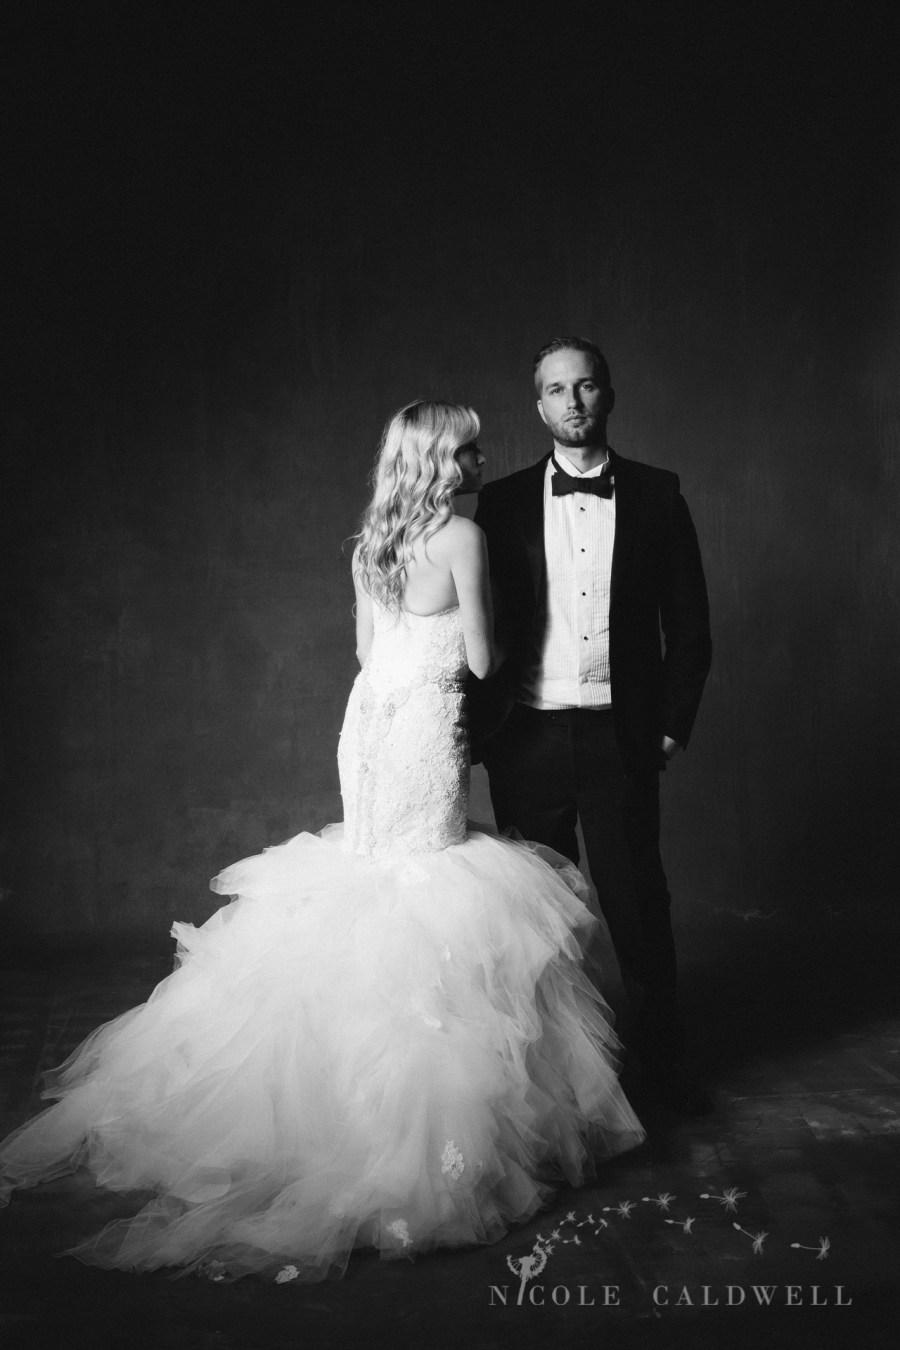 bridal ortraits by nicole caldwell 10